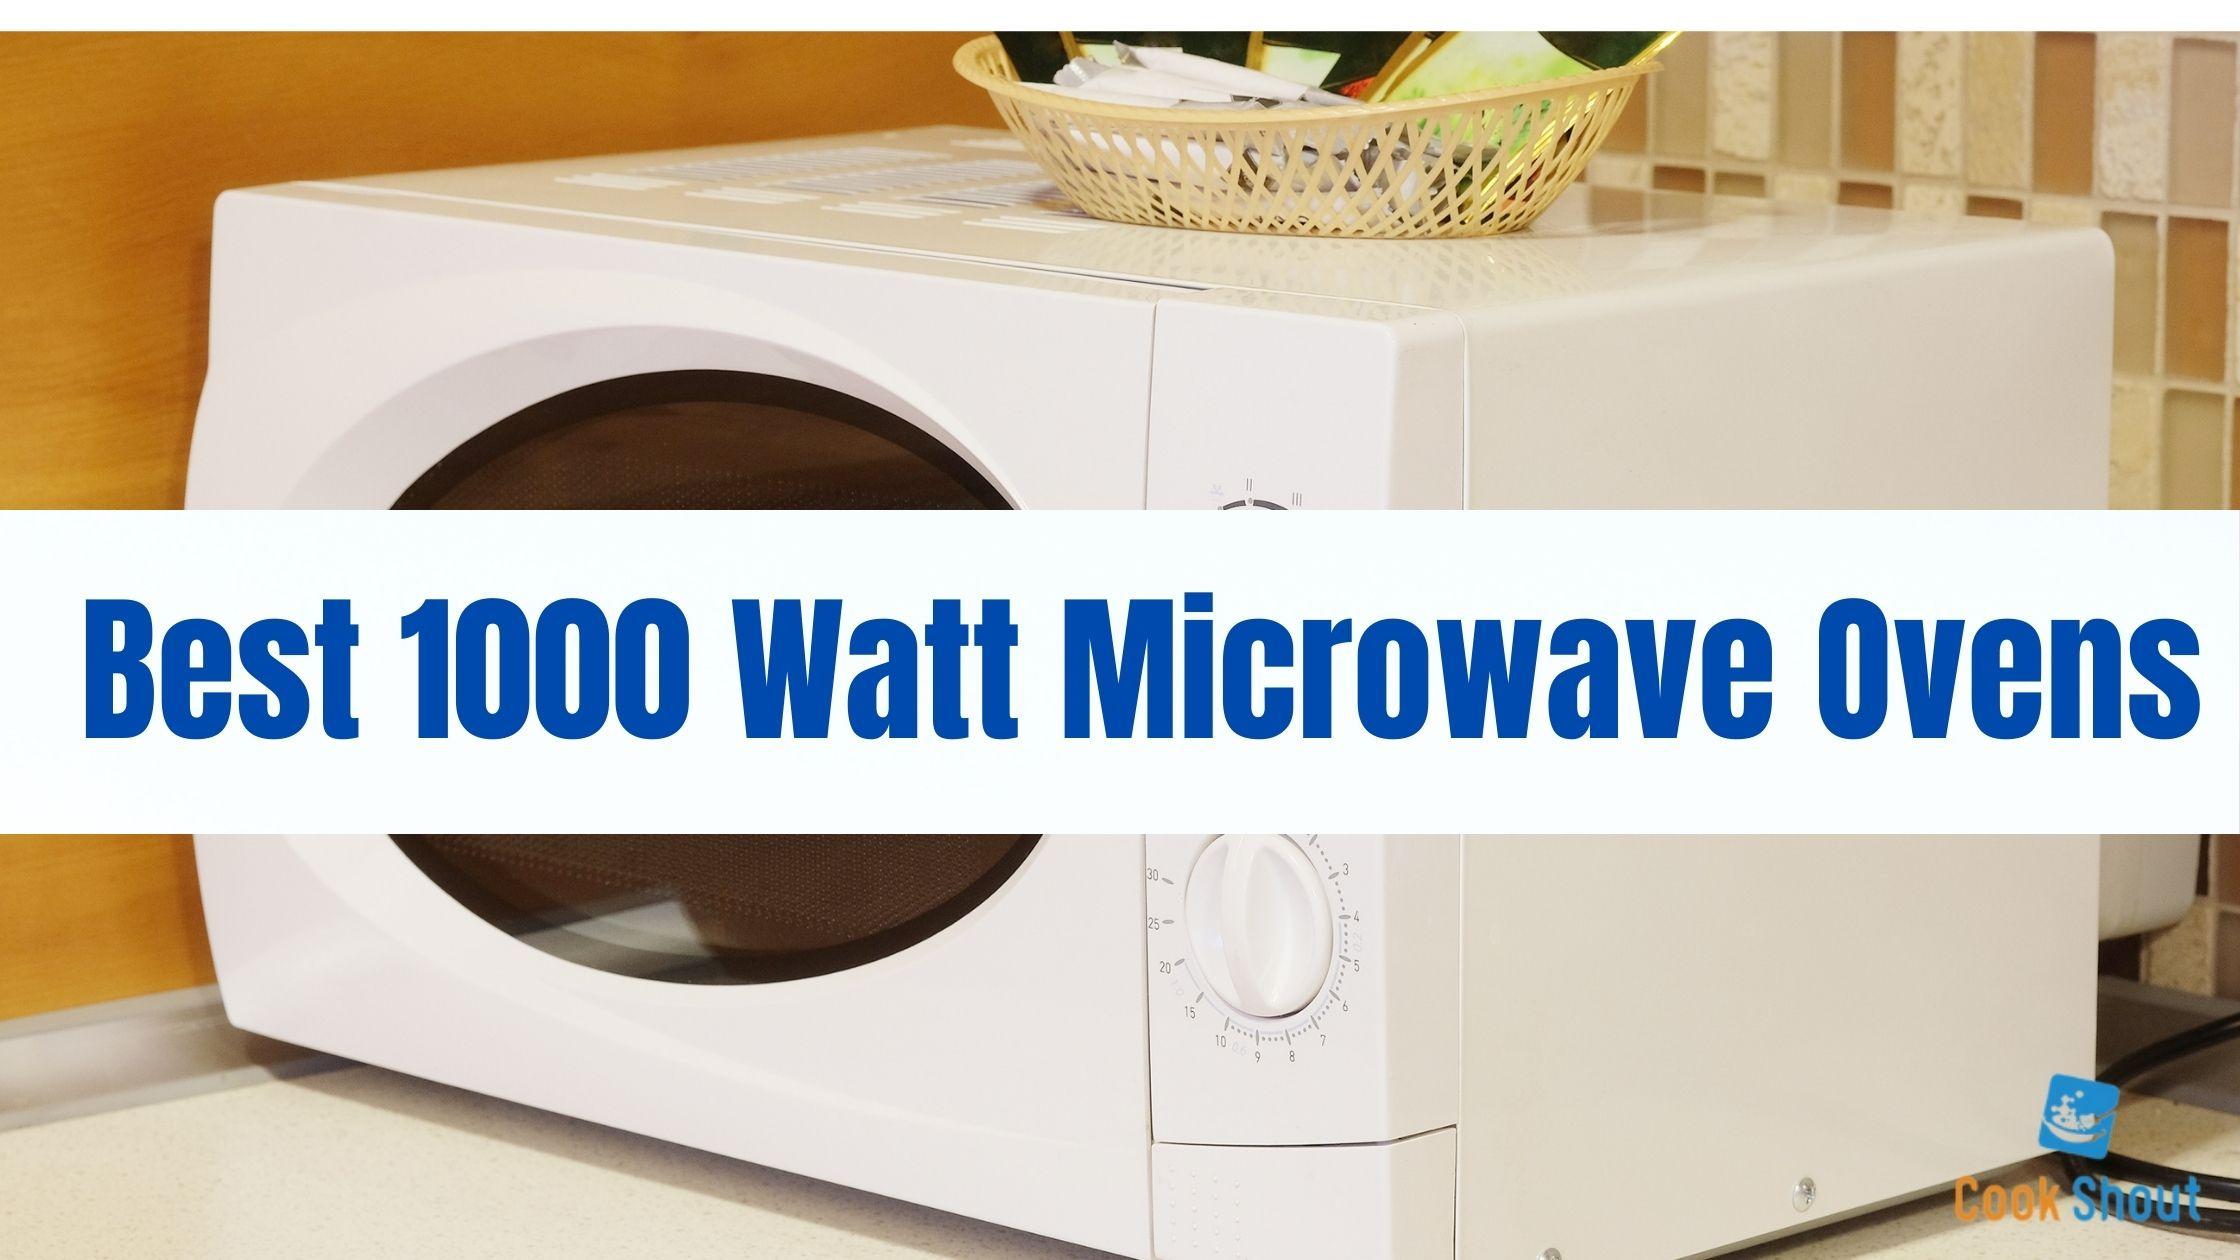 Best 1000 Watt Microwave Ovens